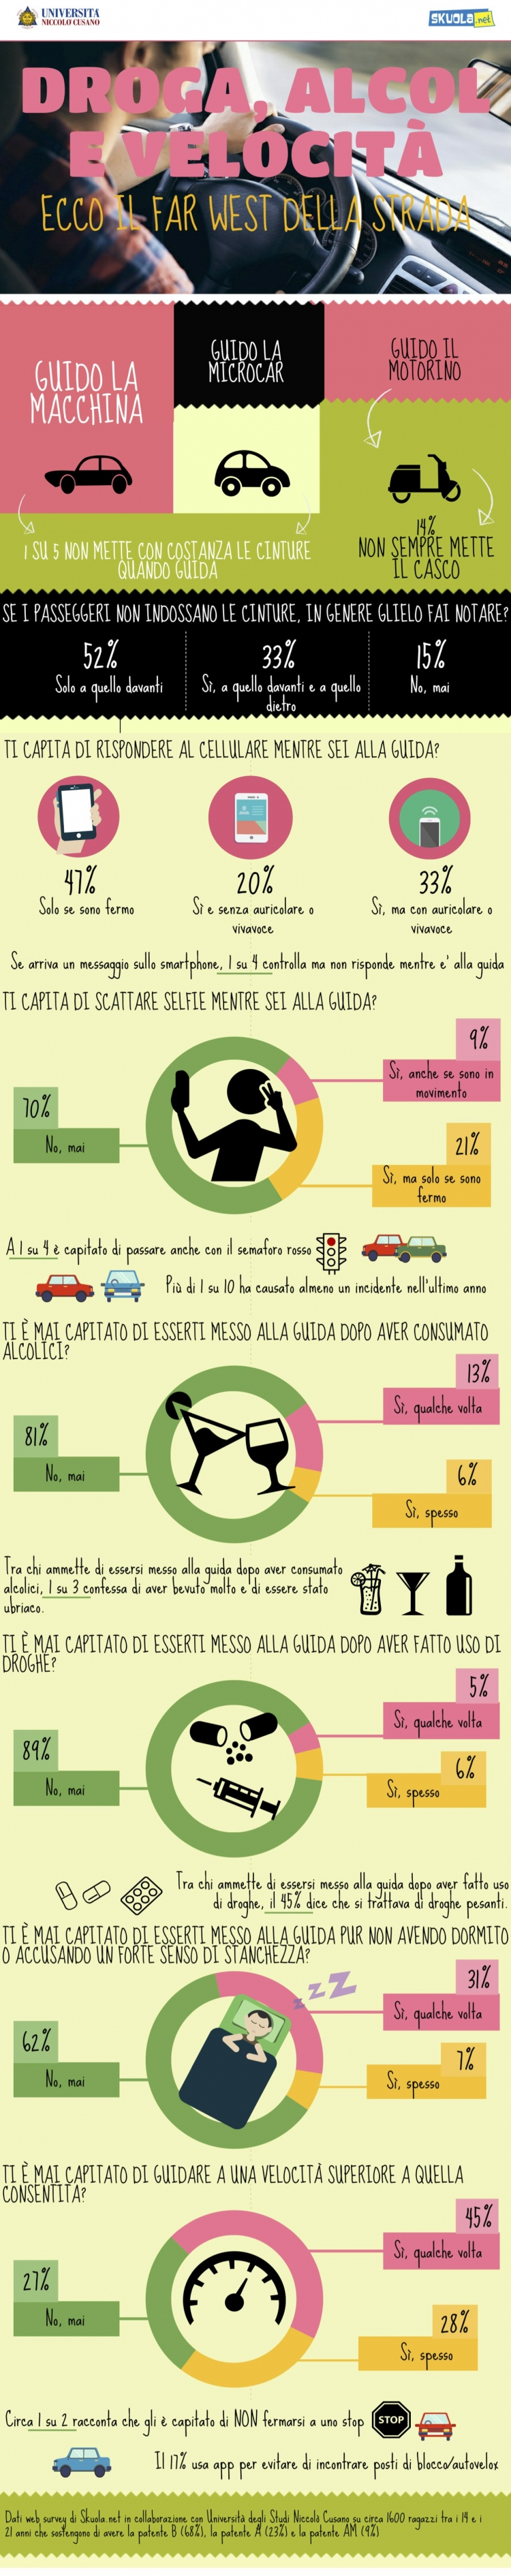 skuola-infografica-neopatentati-alla-guida-750x3781.jpg